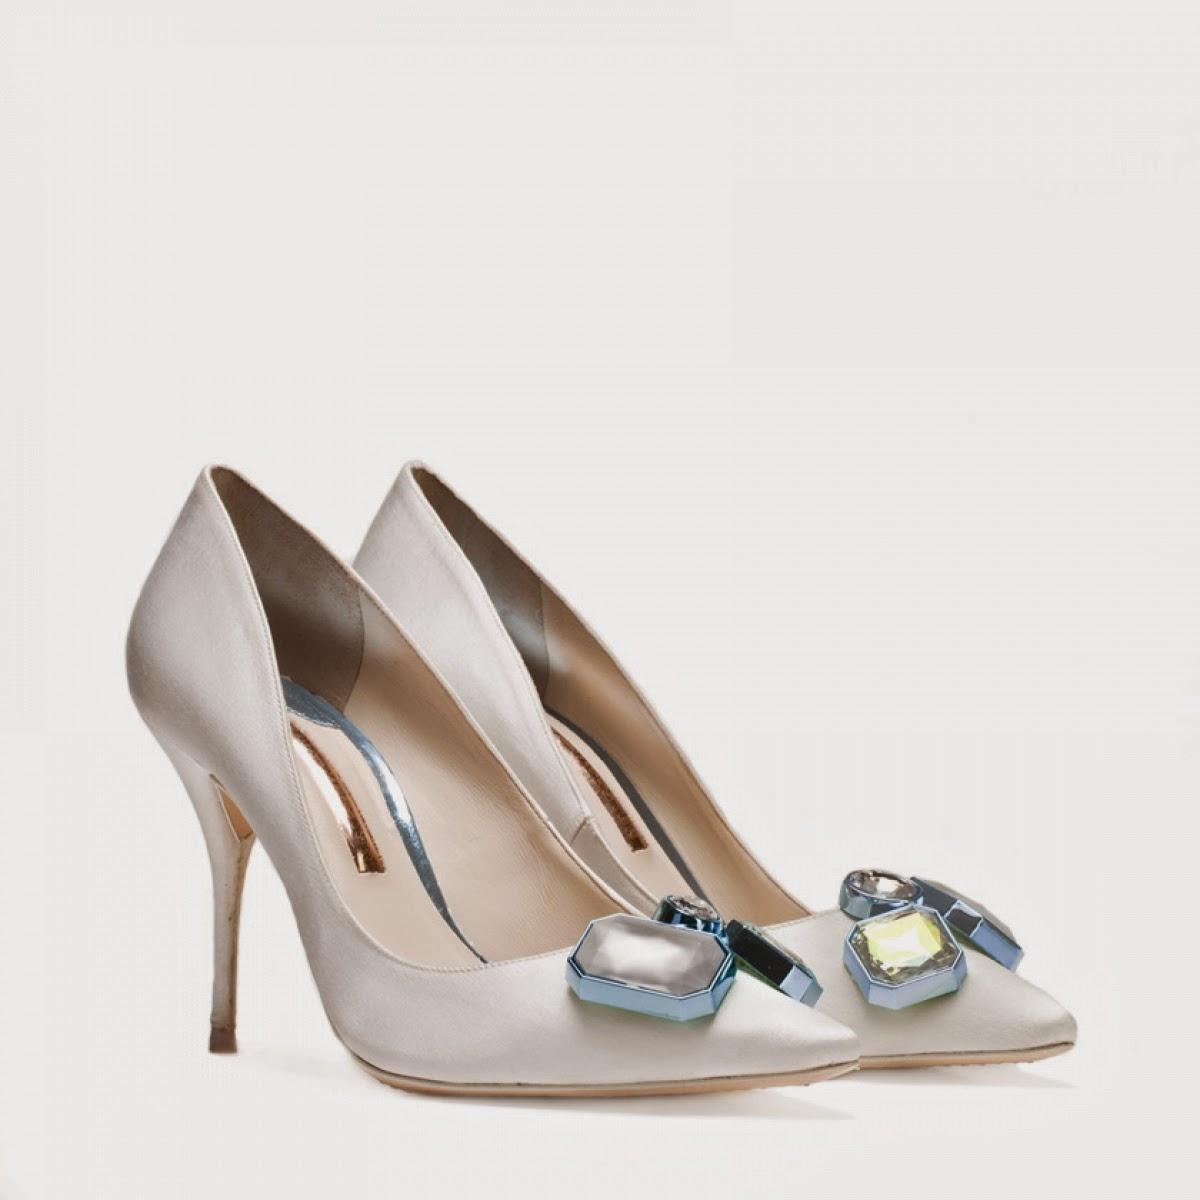 Bridal magic wedding shoes for cool brides for Sophia webster wedding shoes